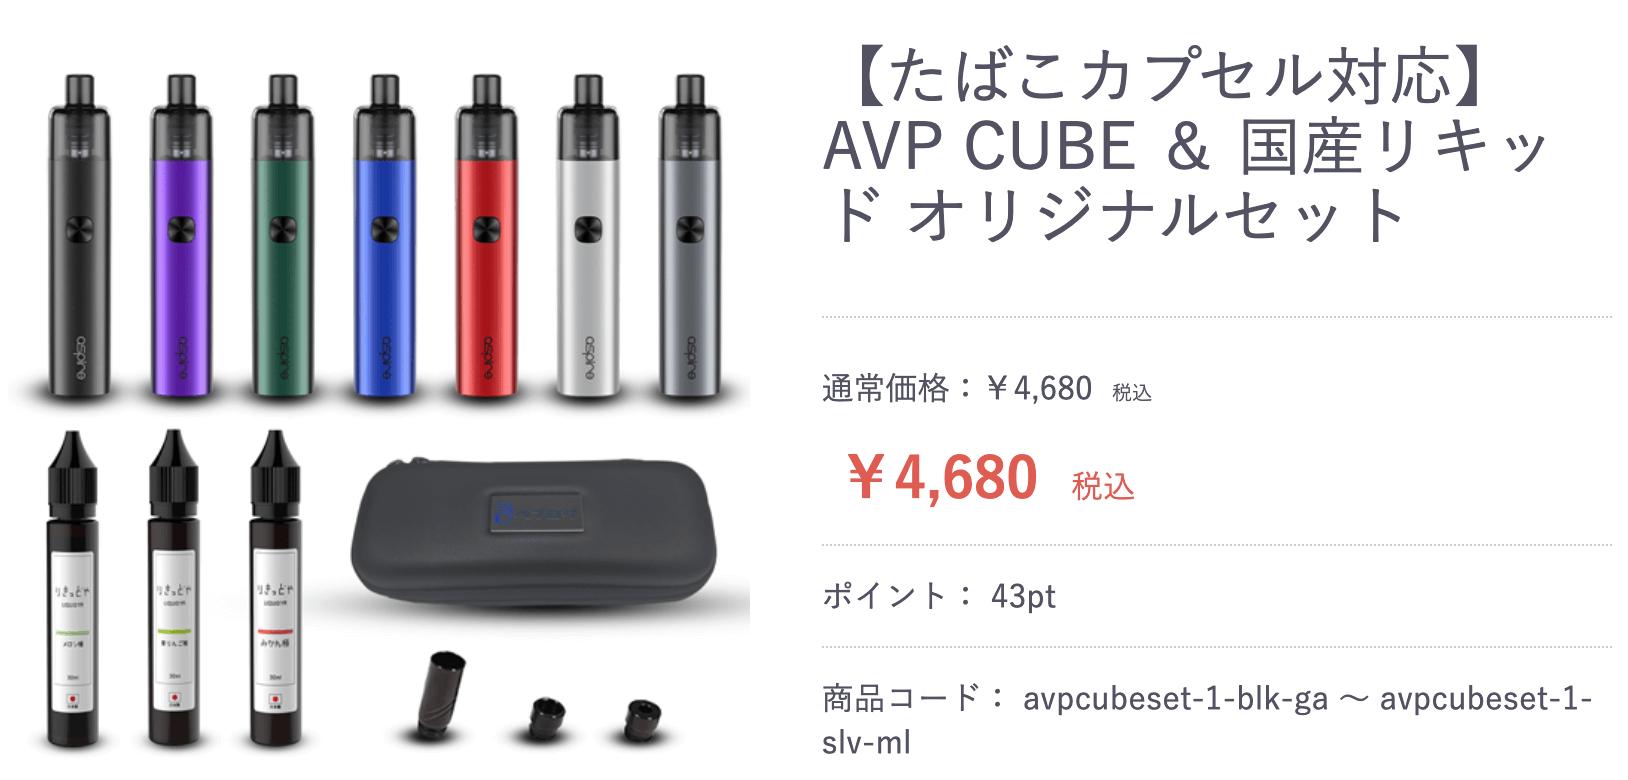 AVP CUBEのオリジナルセット